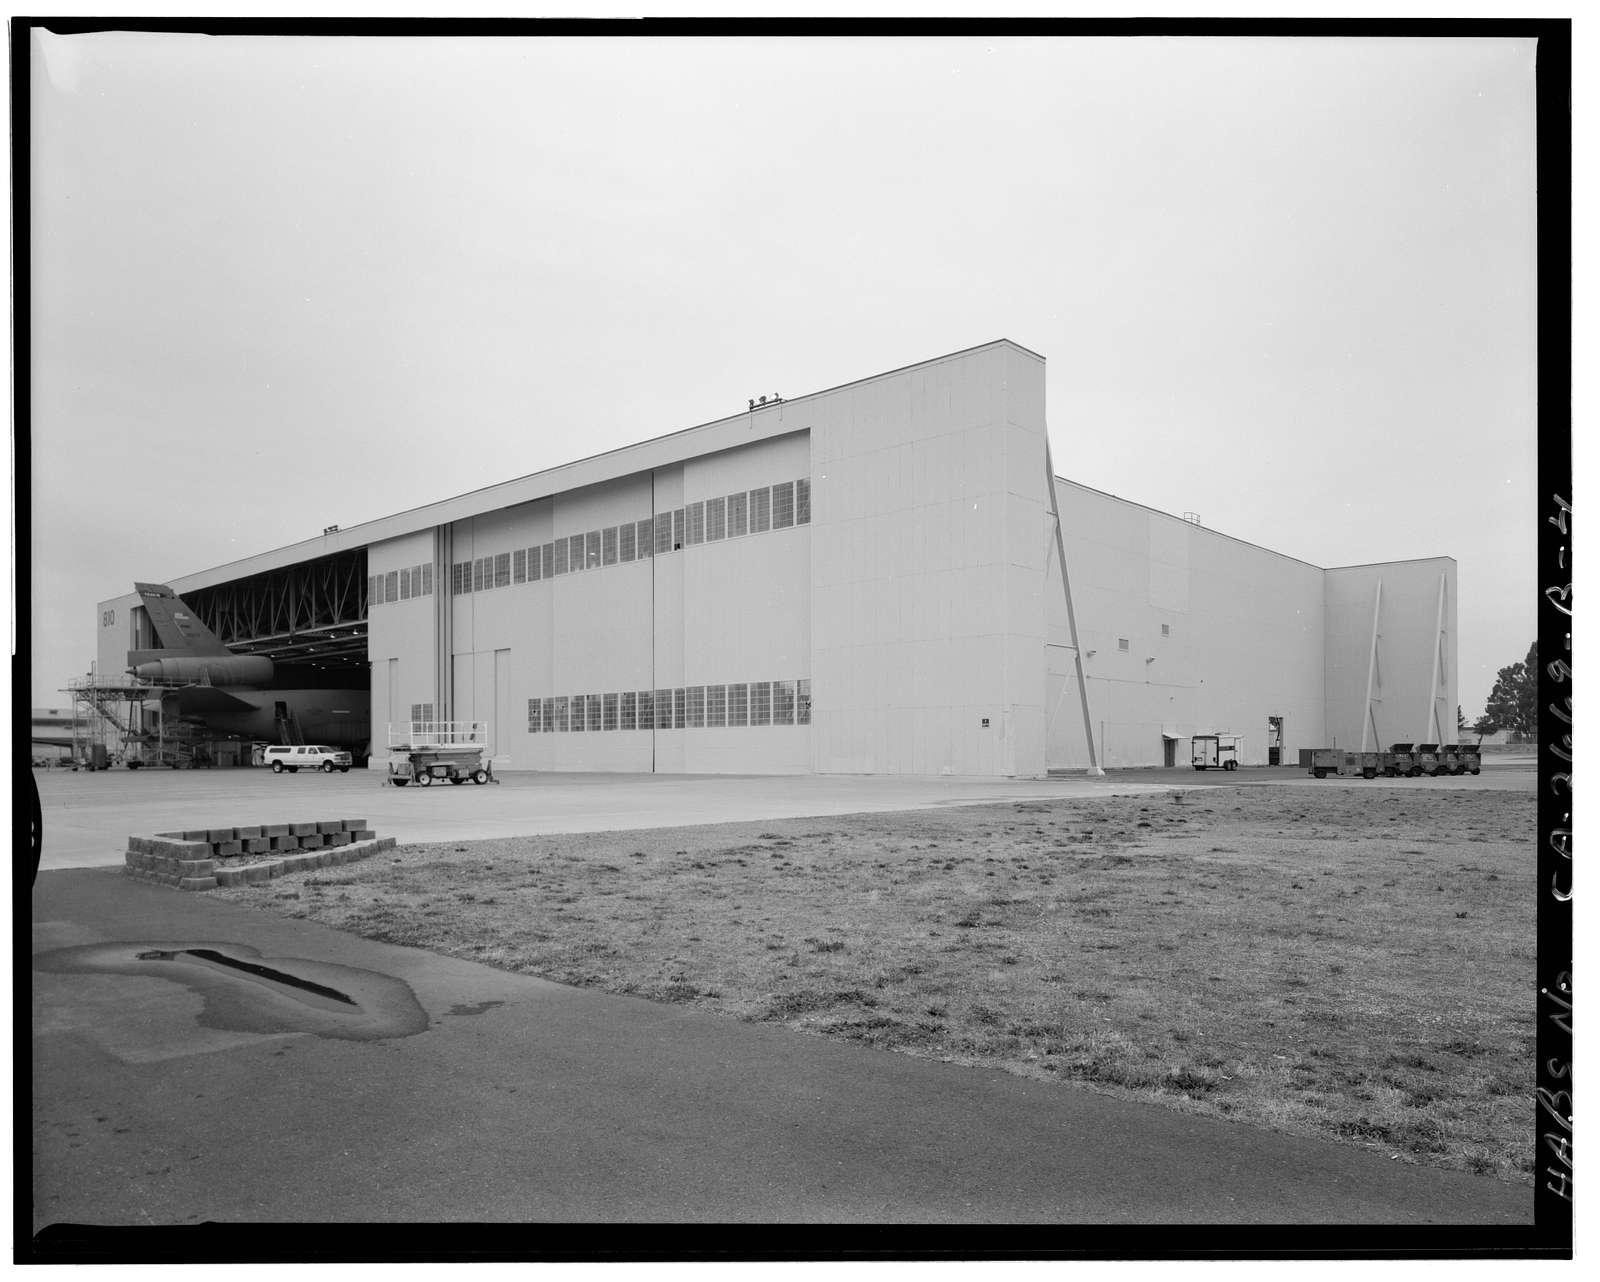 Travis Air Force Base, B-36 Hangar, Between Woodskill Avenue & Ellis, adjacent to Taxiway V & W, Fairfield, Solano County, CA